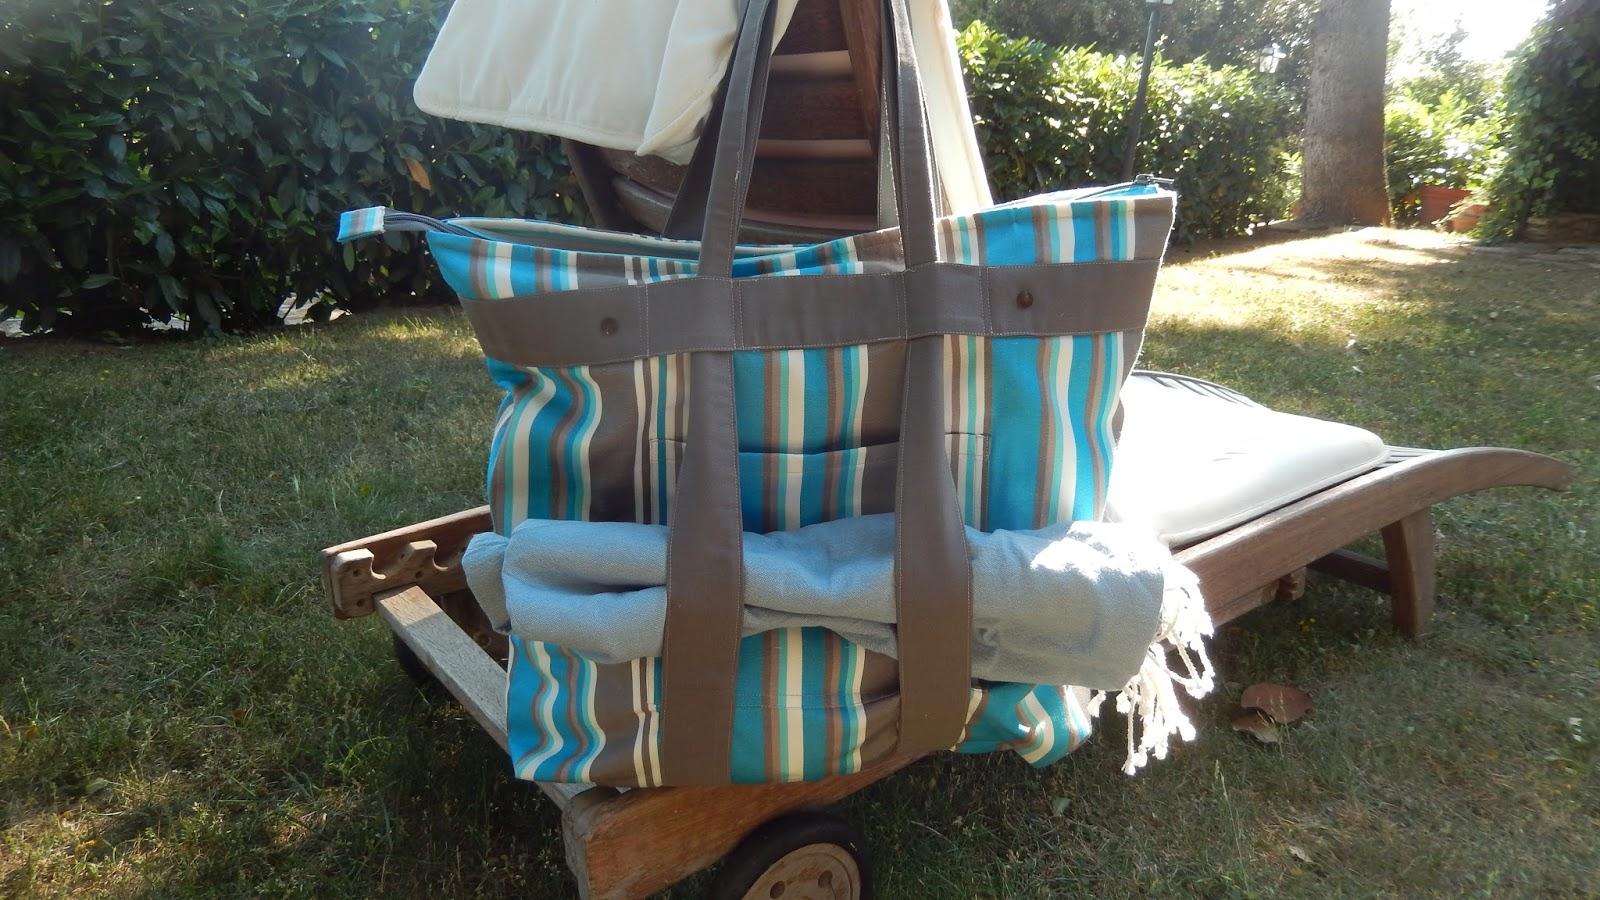 olivia twist n hanleitungen rucksack strandtasche badetasche mit abnehmbarer isolierender. Black Bedroom Furniture Sets. Home Design Ideas